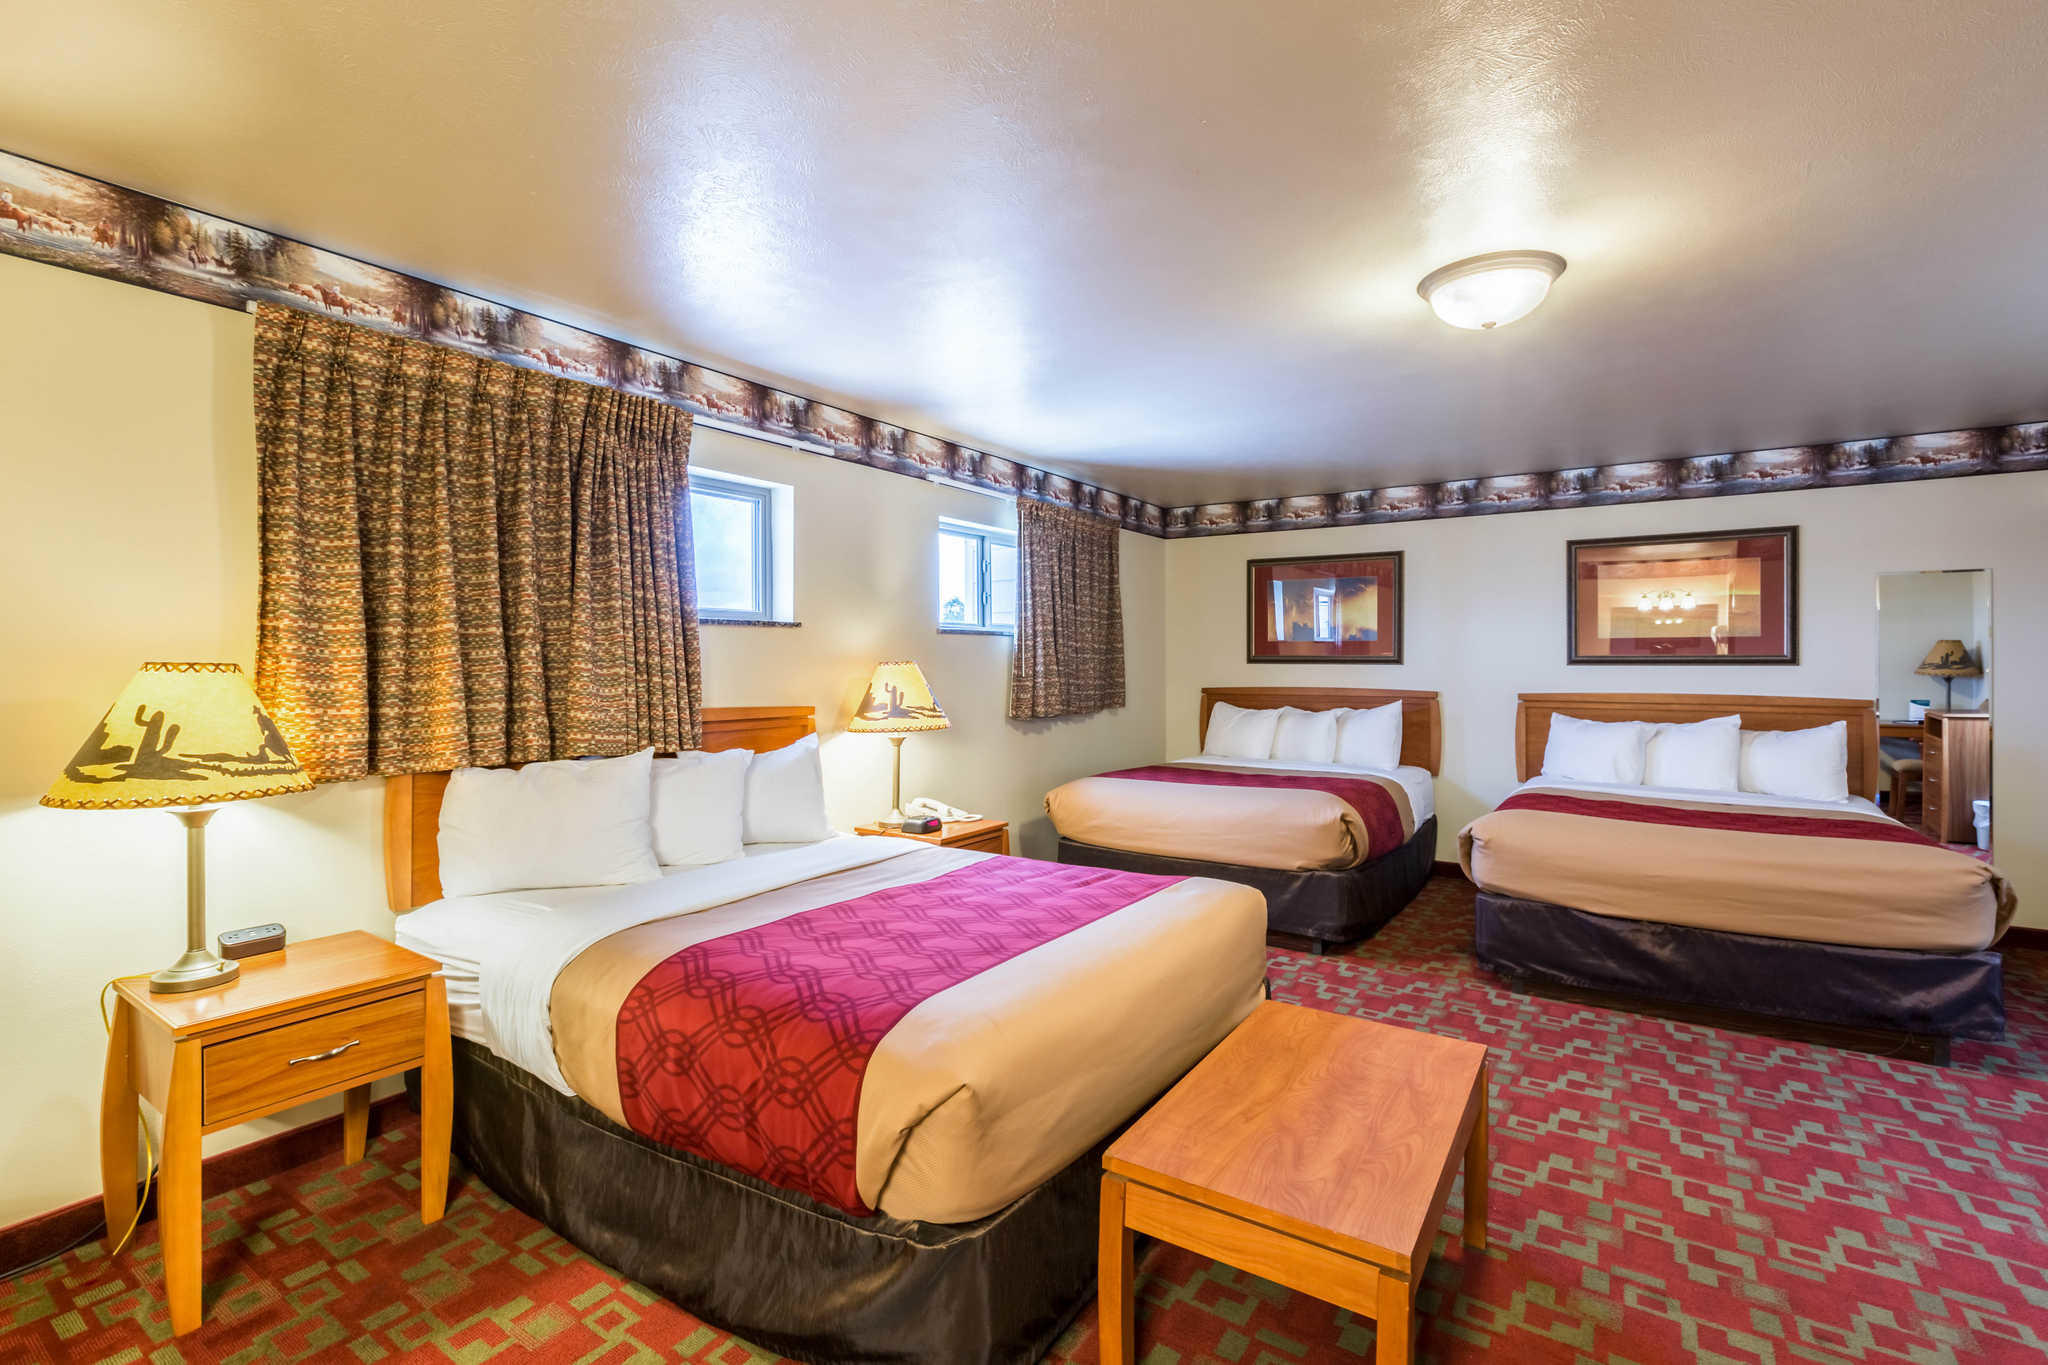 Econo Lodge Inn Amp Suites In Valentine NE 69201